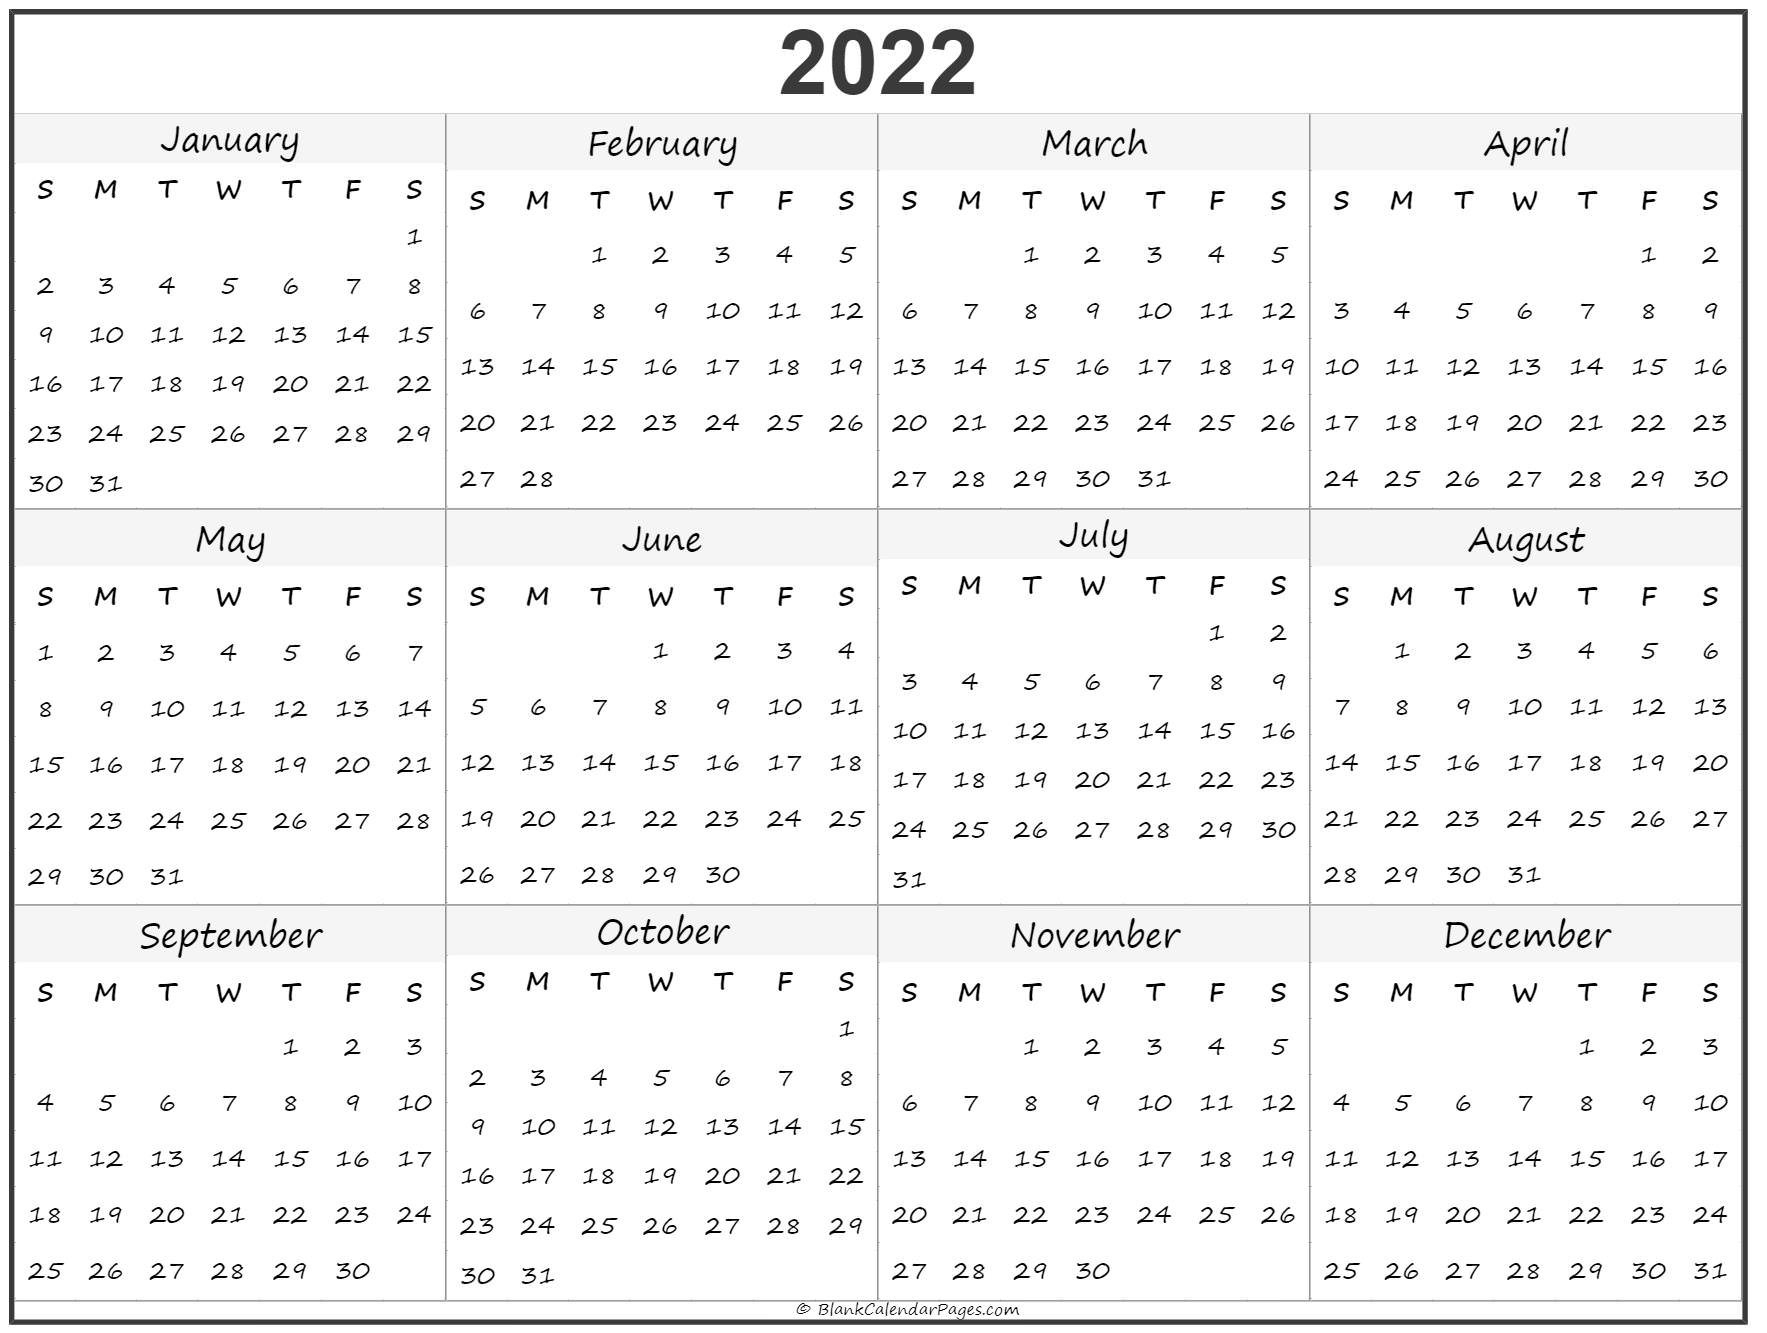 2022 Year Calendar | Yearly Printable throughout Free Printable 2022 September Calendar